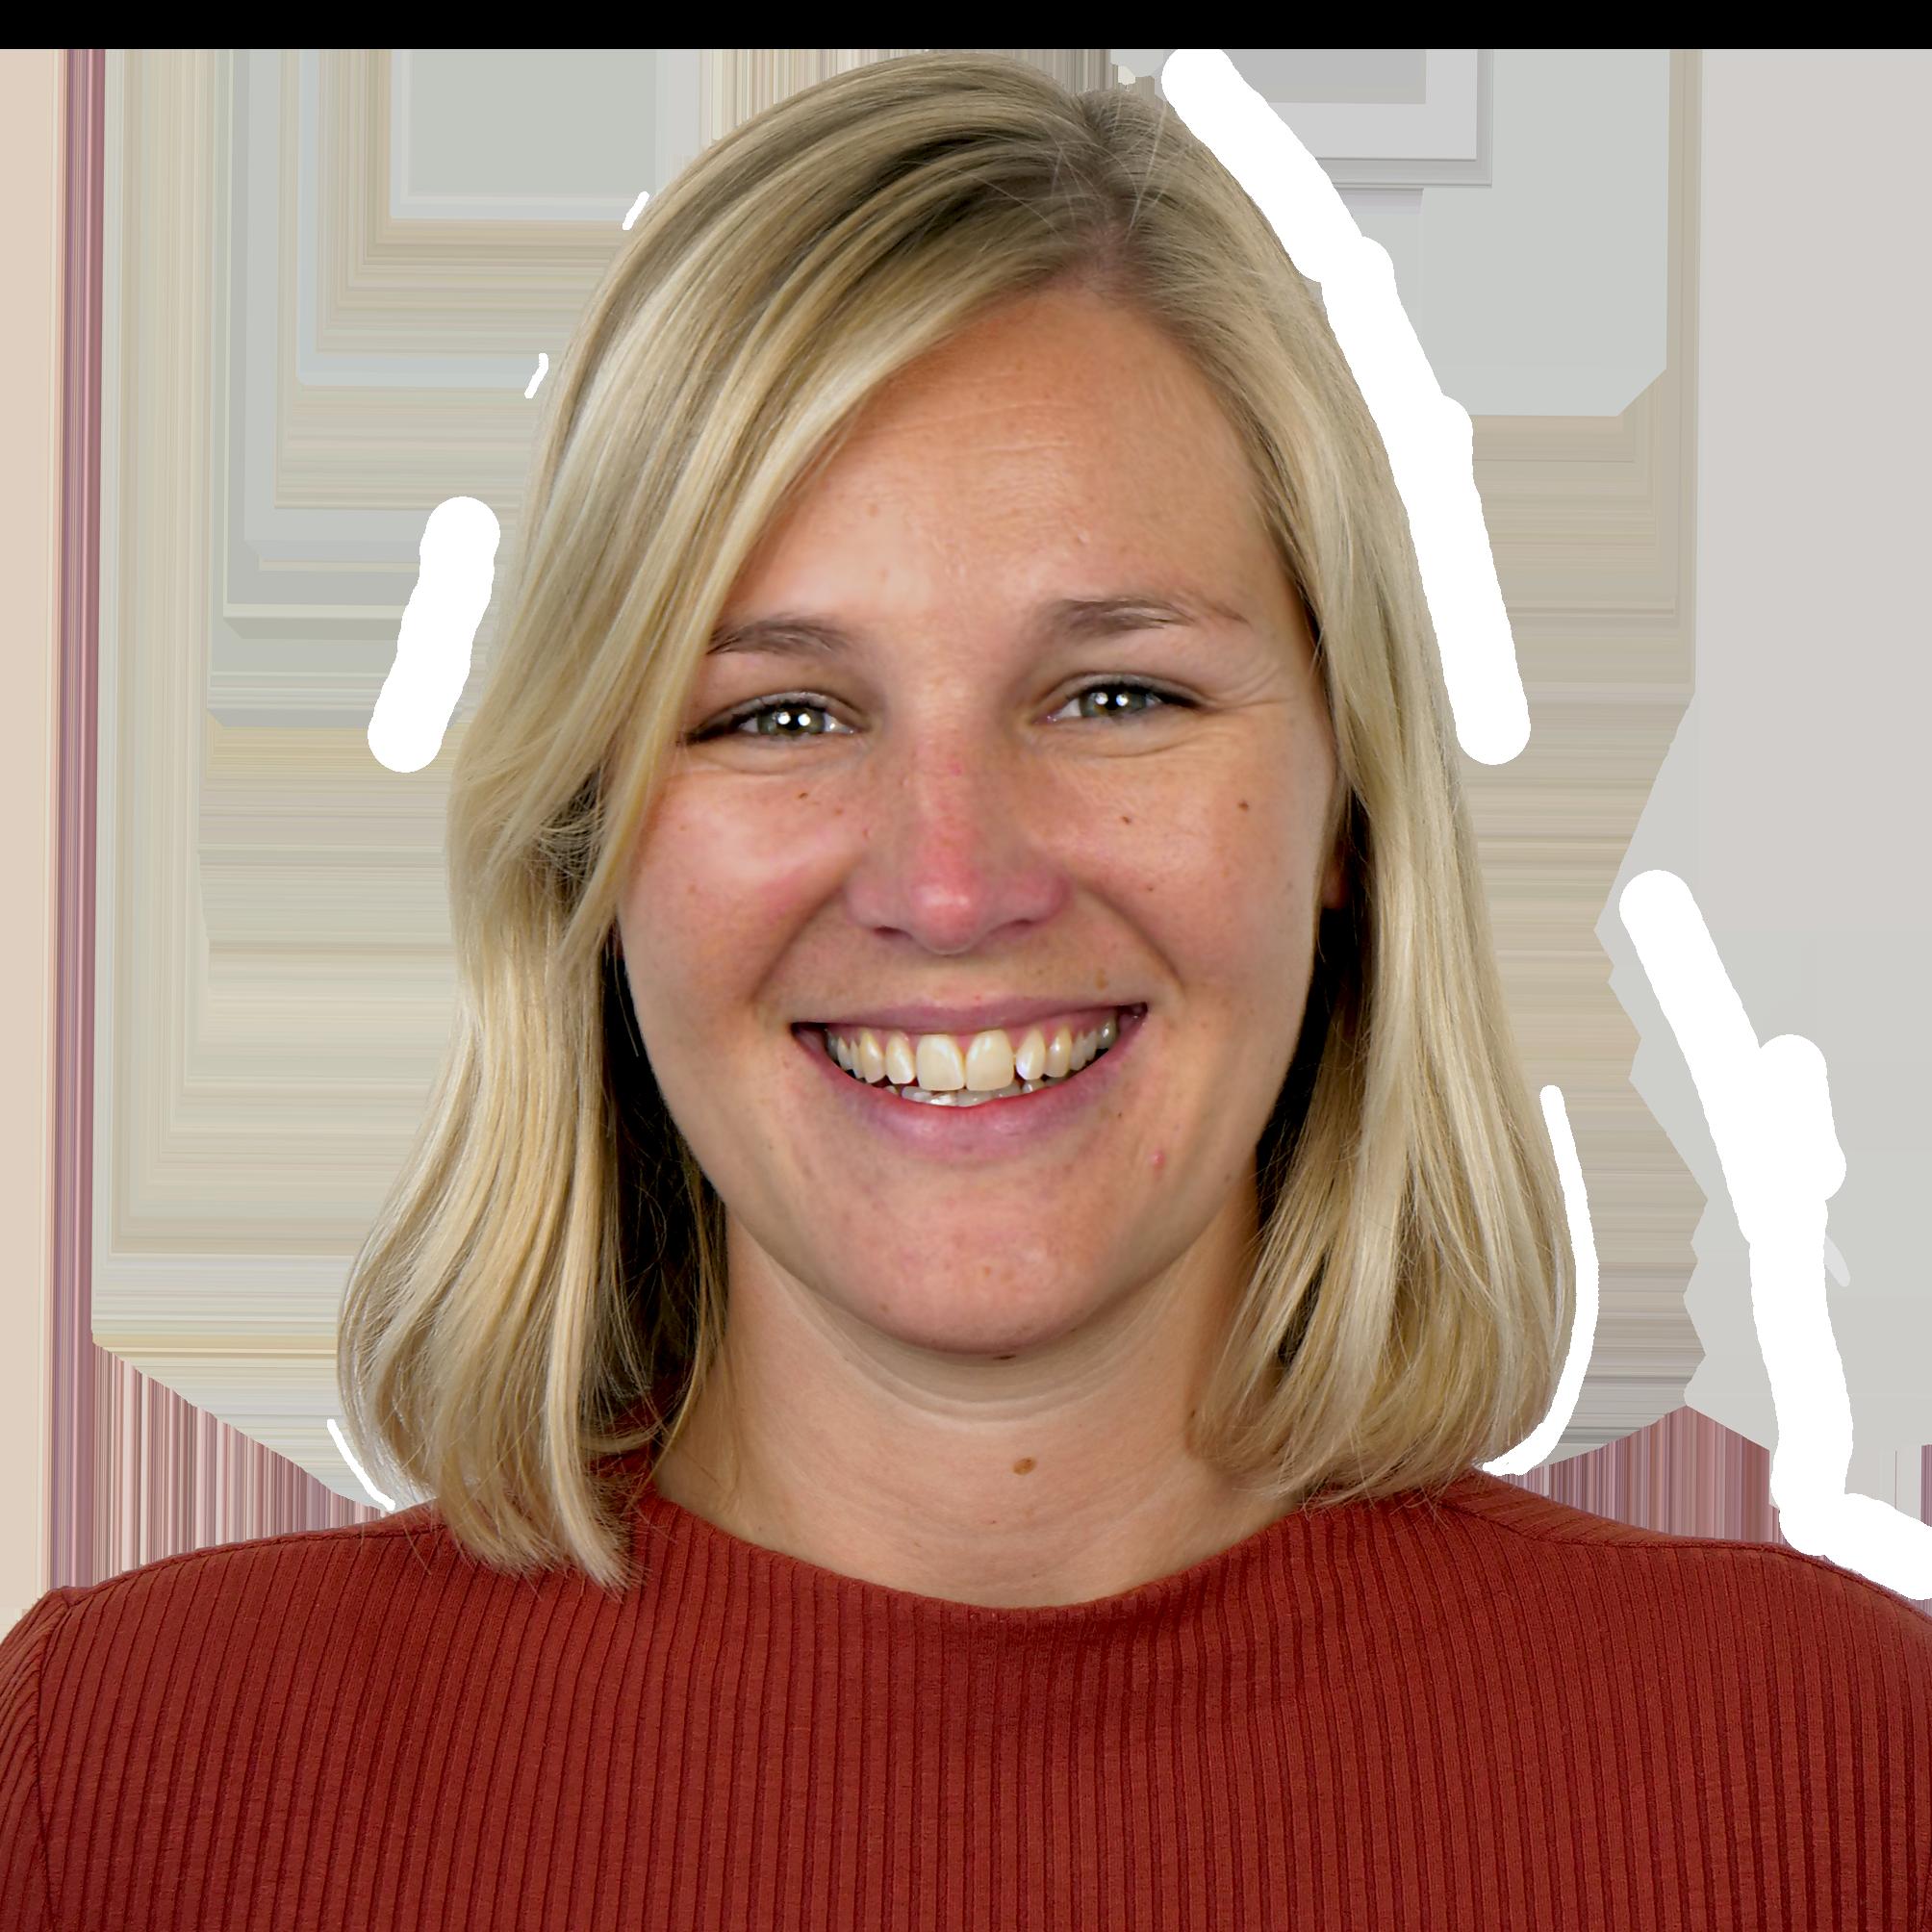 Katja Sonfeld